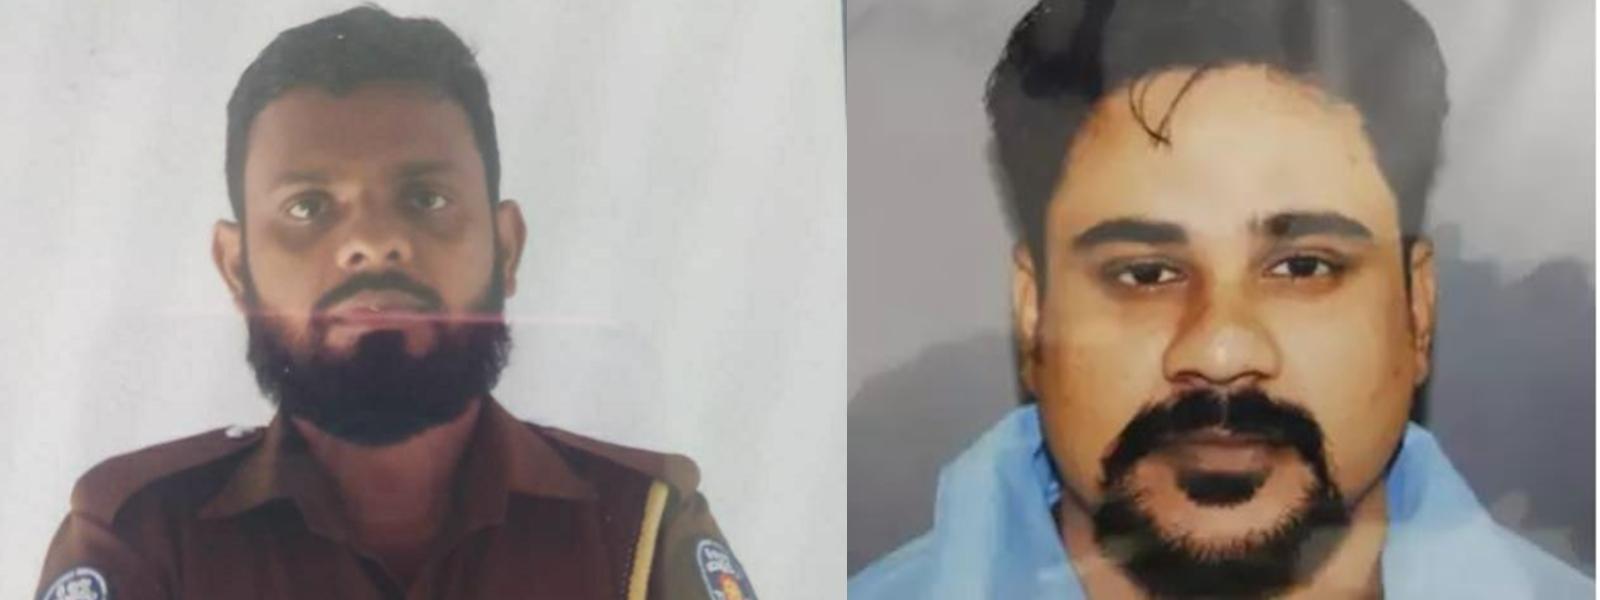 Coimbatore CB-CID Unit investigating 'Angoda Lokka's death also probing SL Police Officer